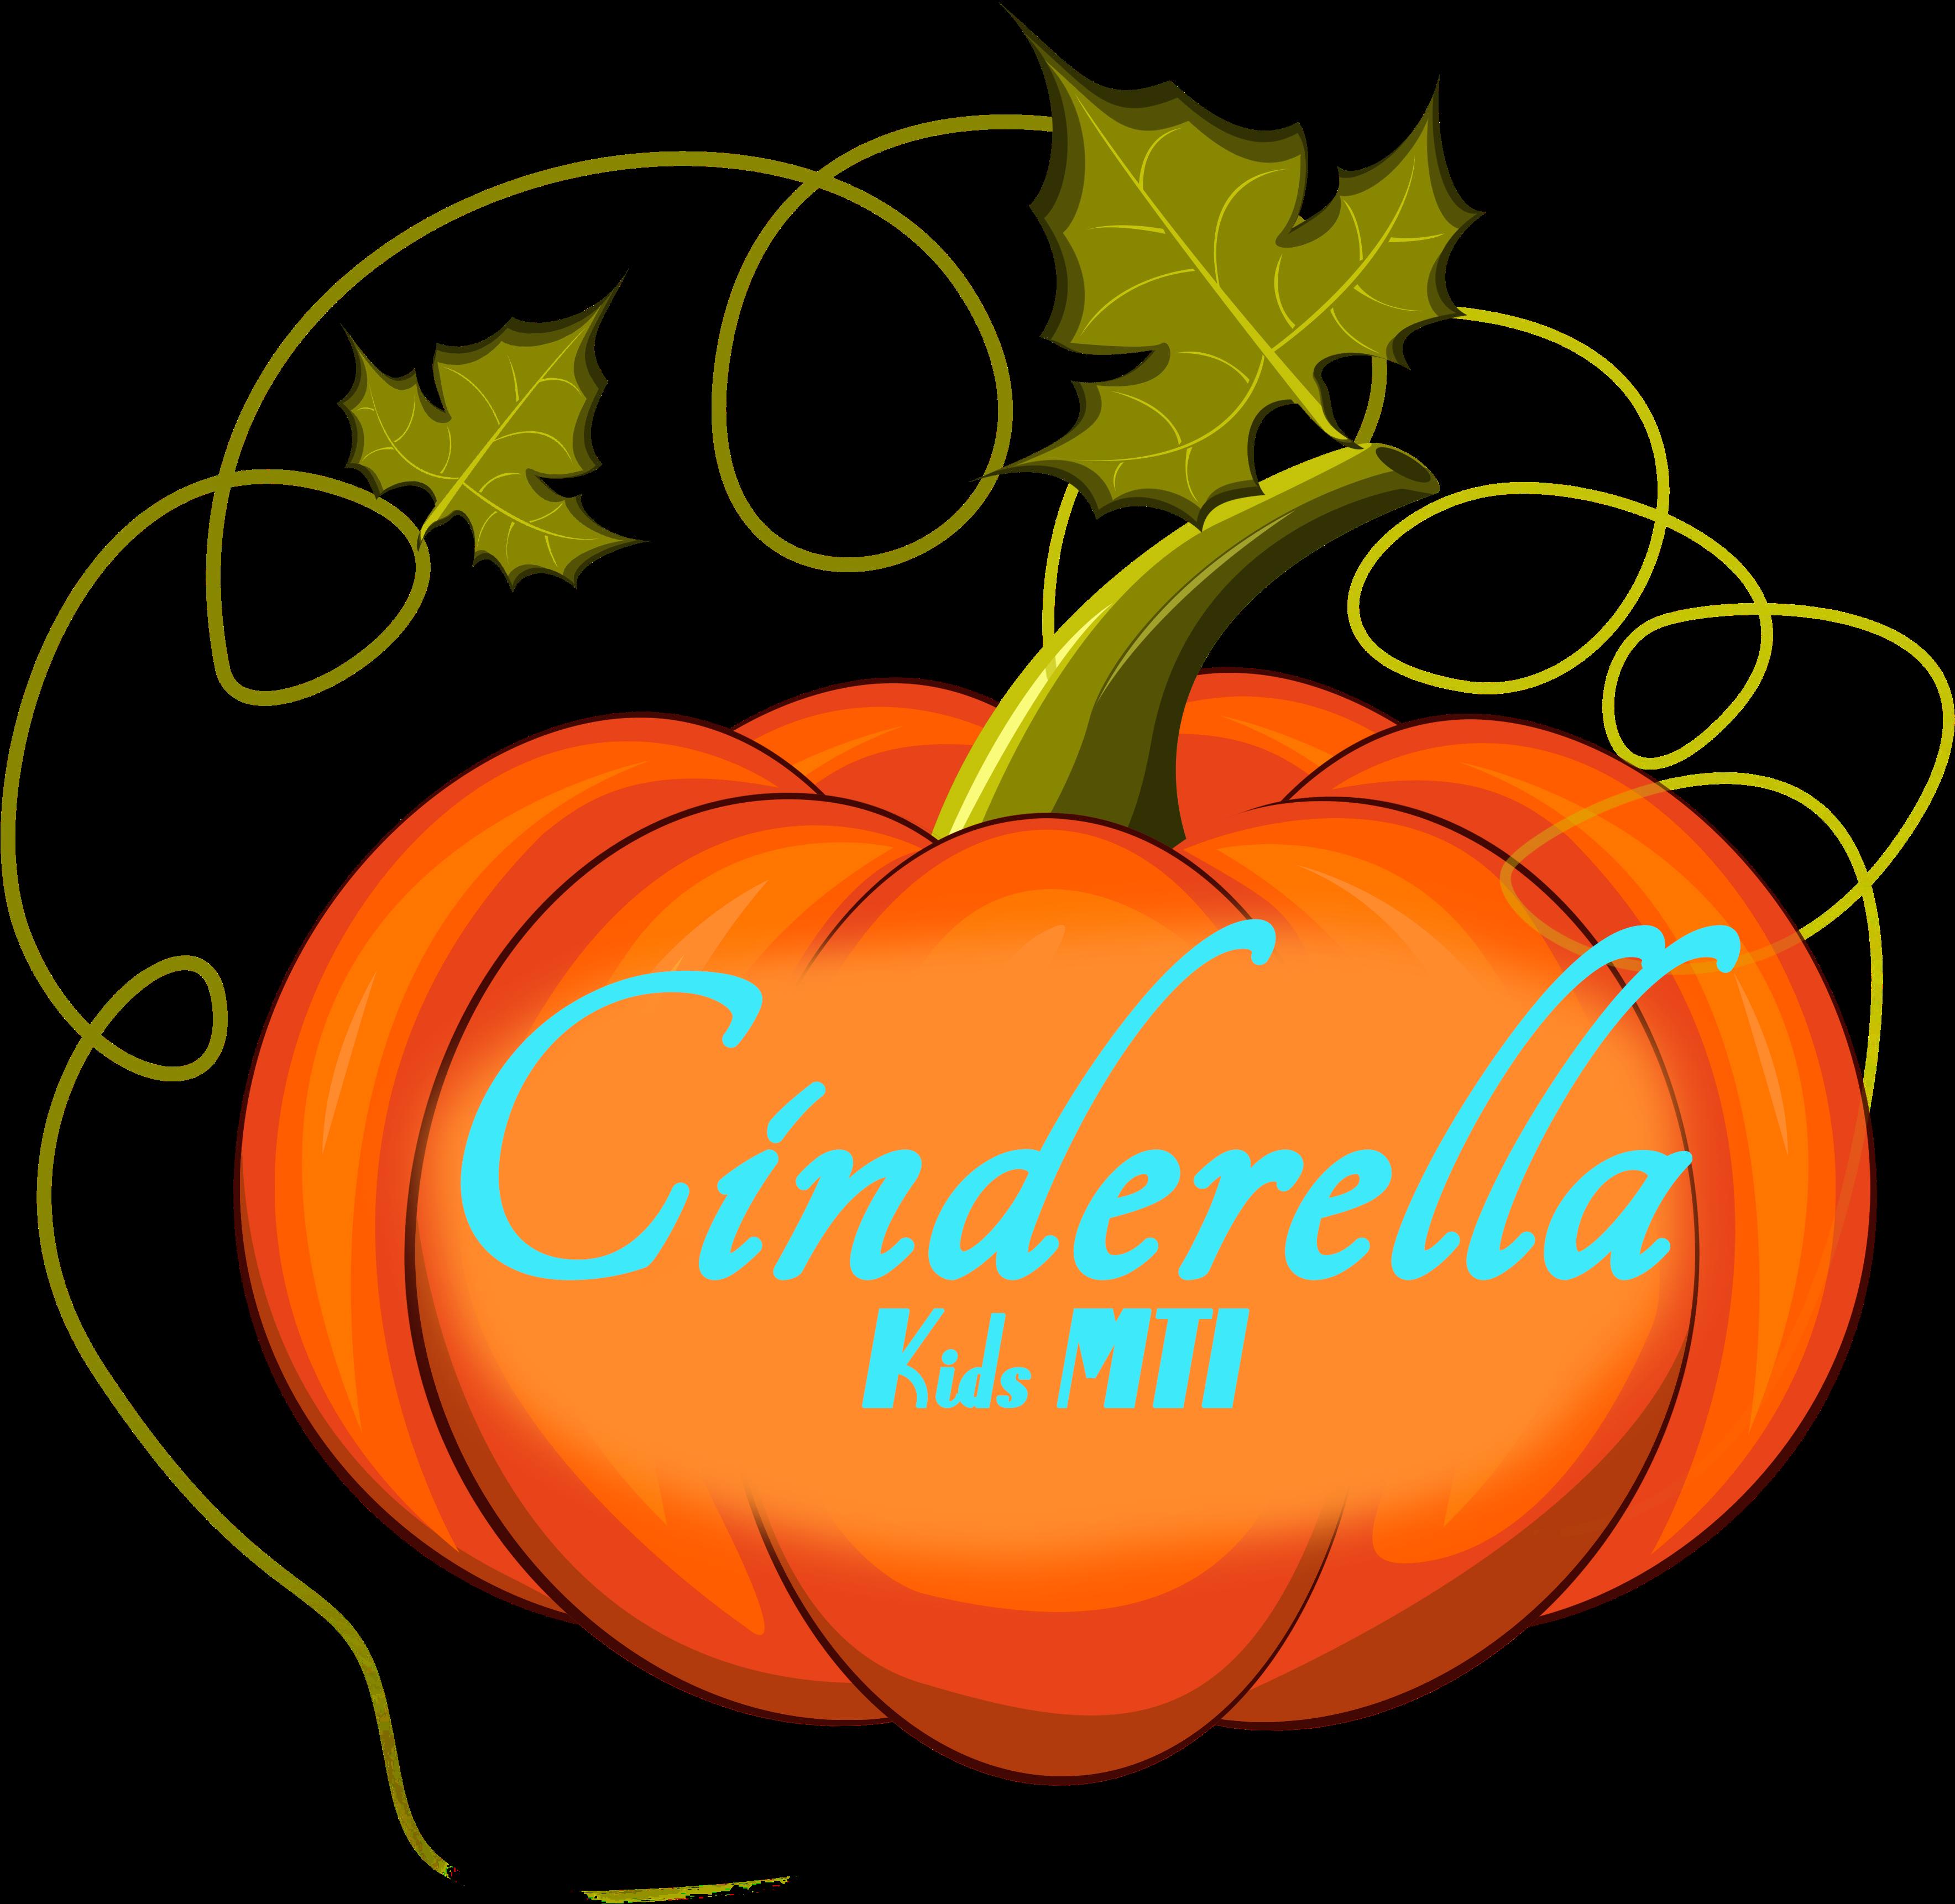 Pumpkin For Cinderella Copyadempster2018 08 28t14 Clipart.